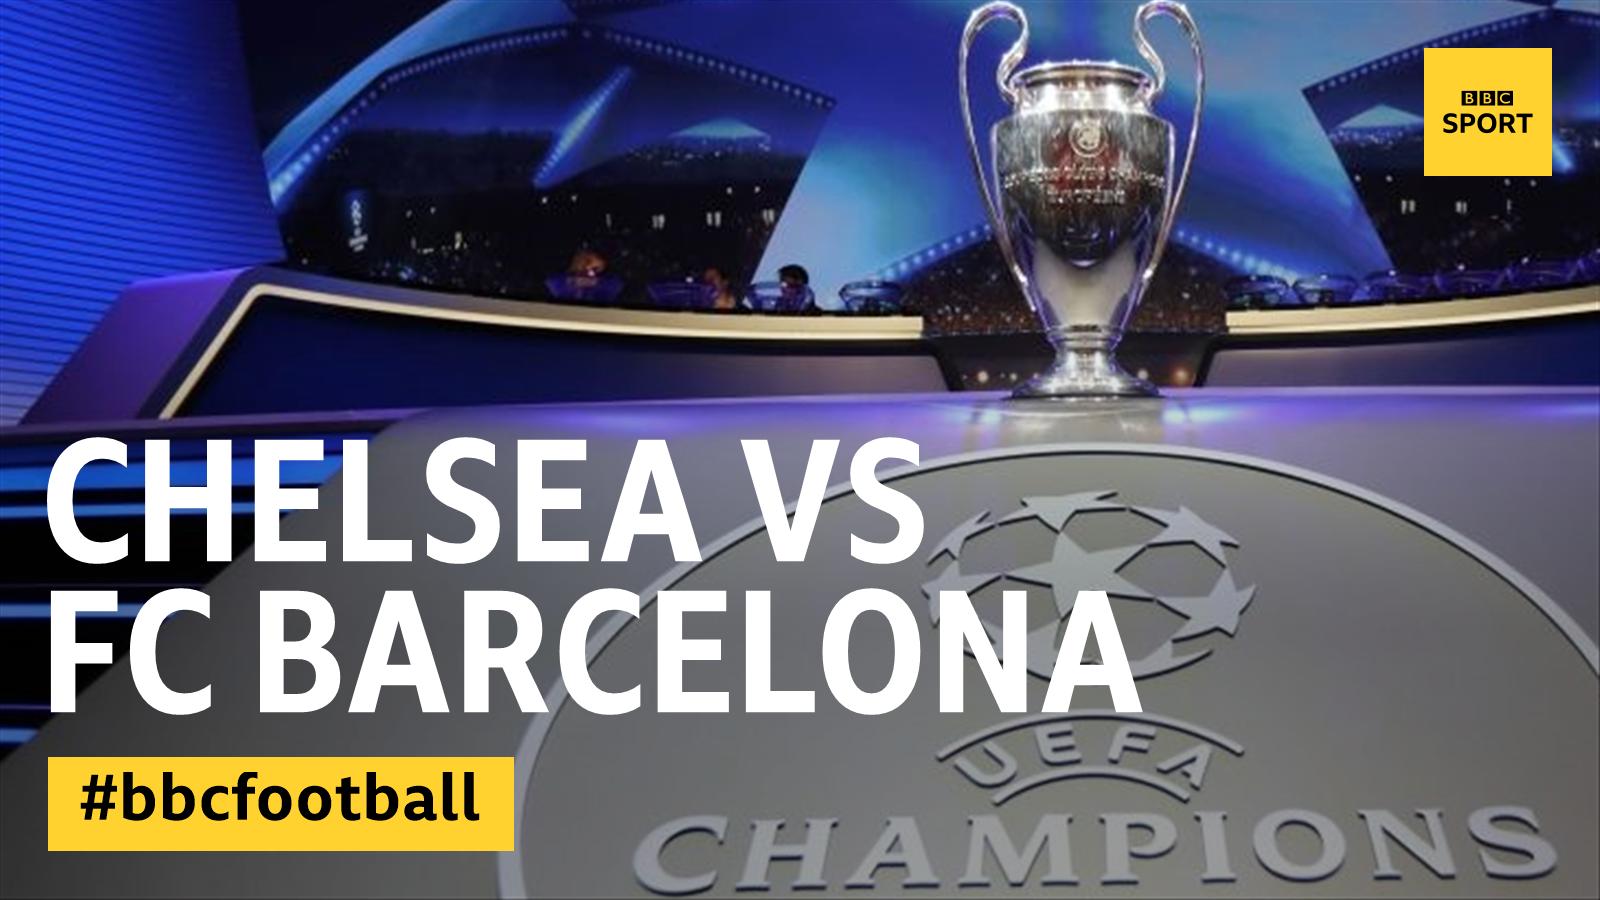 Chelsea v FC Barcelona �� https://t.co/5U77L86HKl #UCLDraw https://t.co/buAGrM8cR3